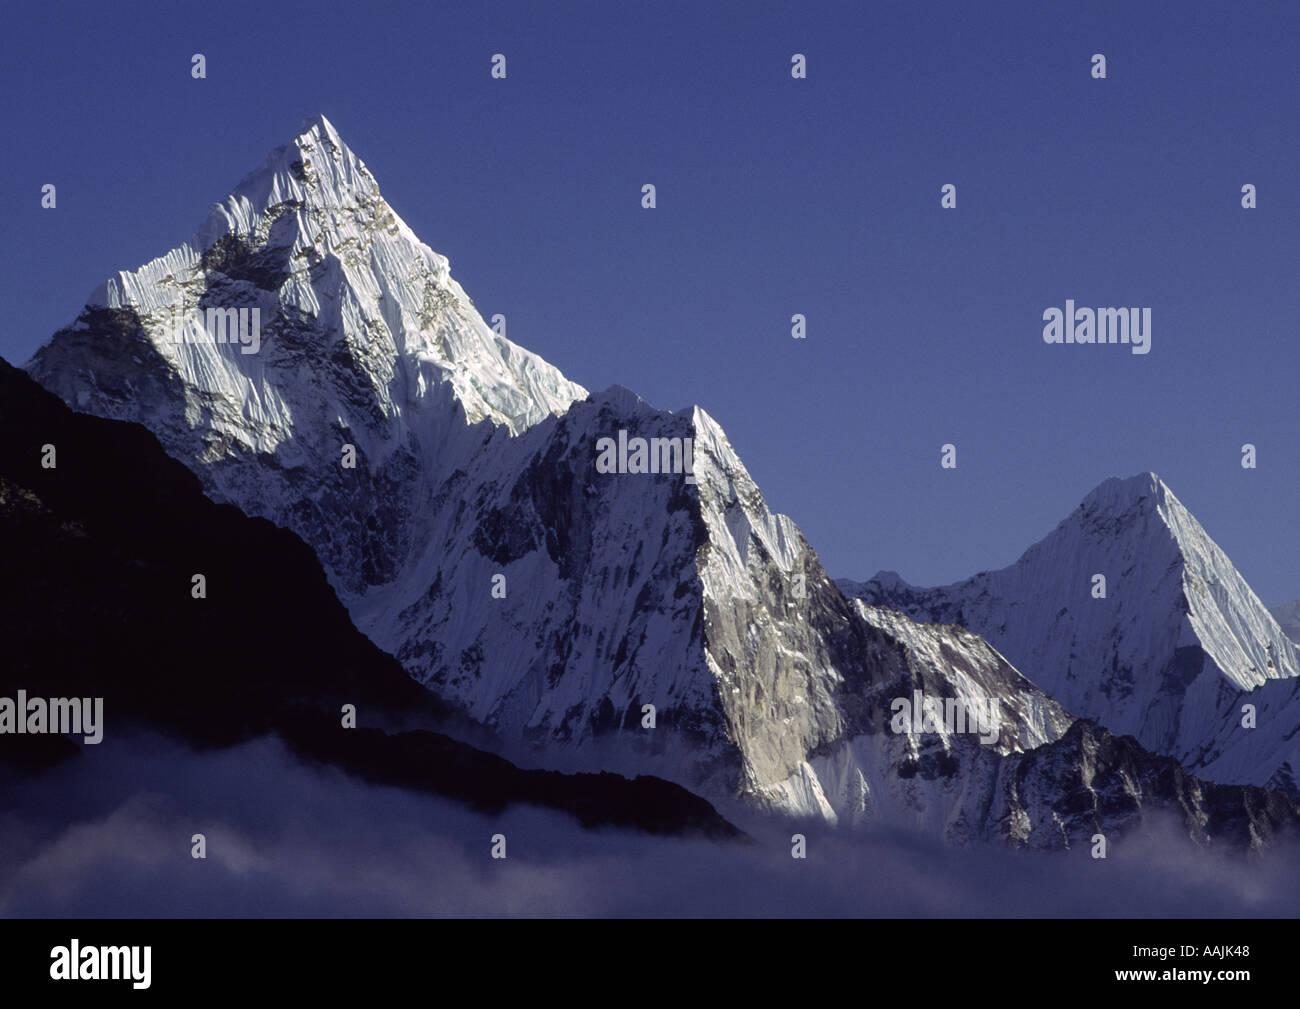 Ama Dablam Khumbu Himal Nepal - Stock Image